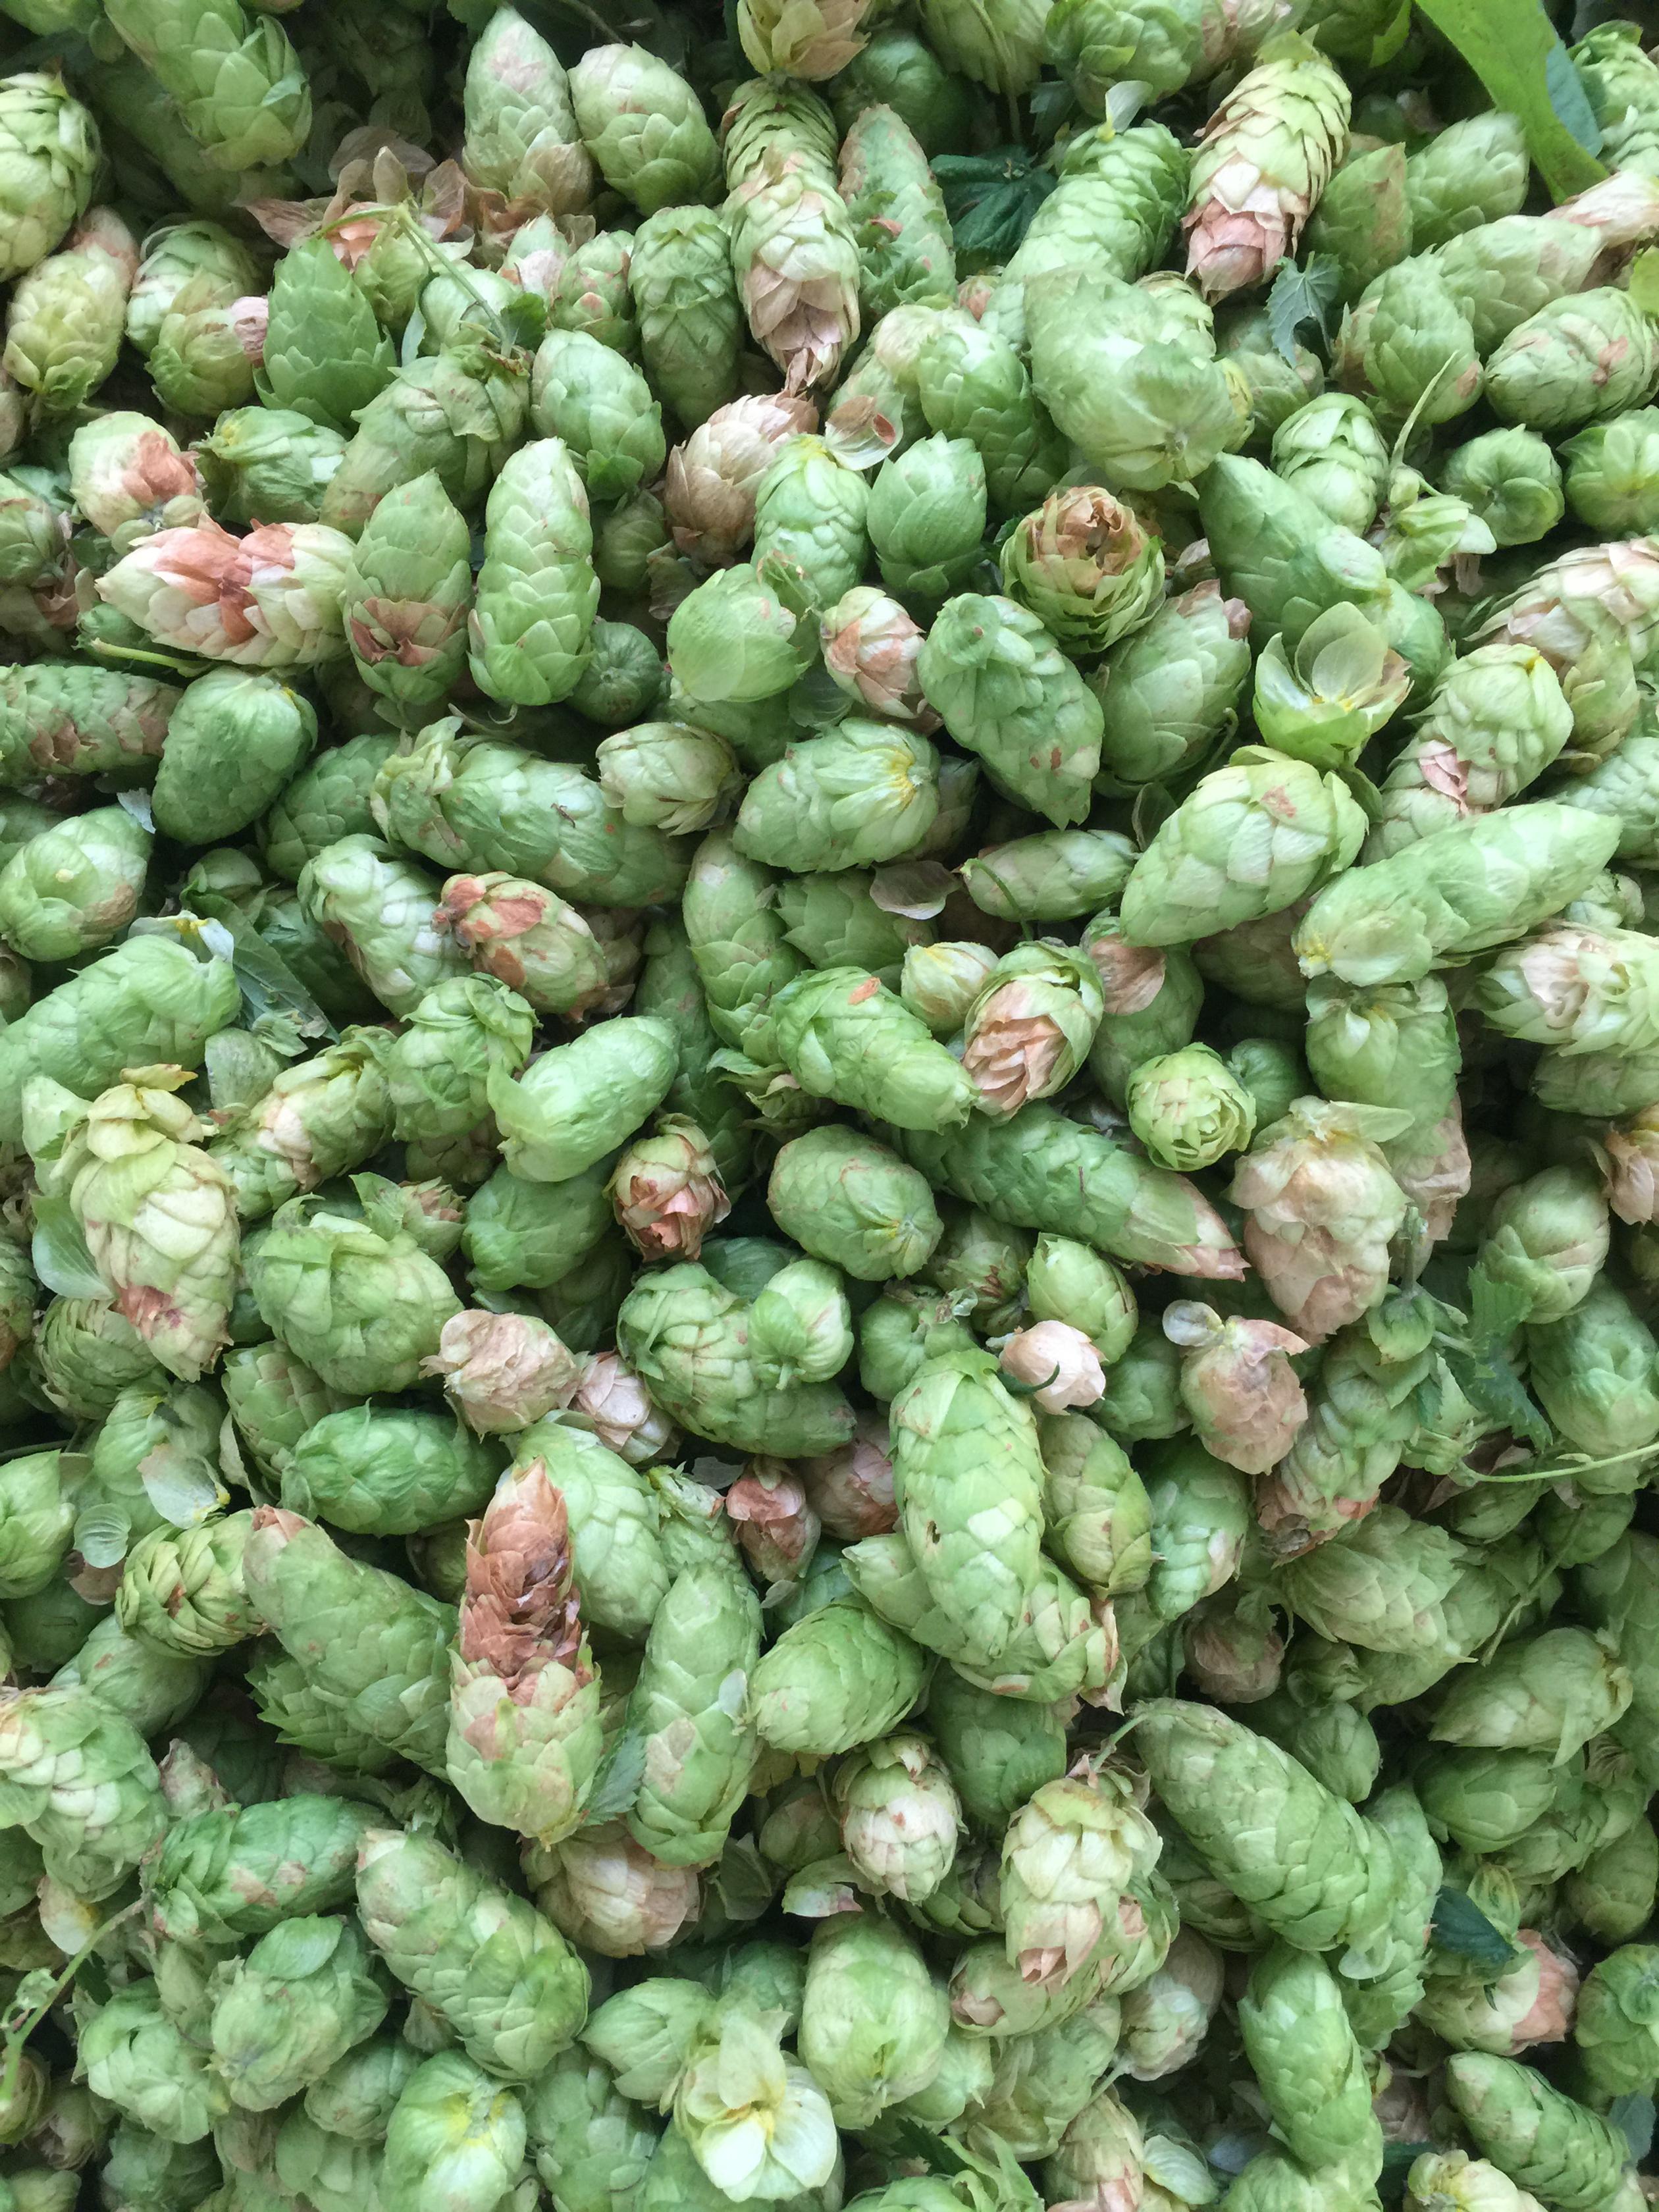 Powdery mildew on hop cones